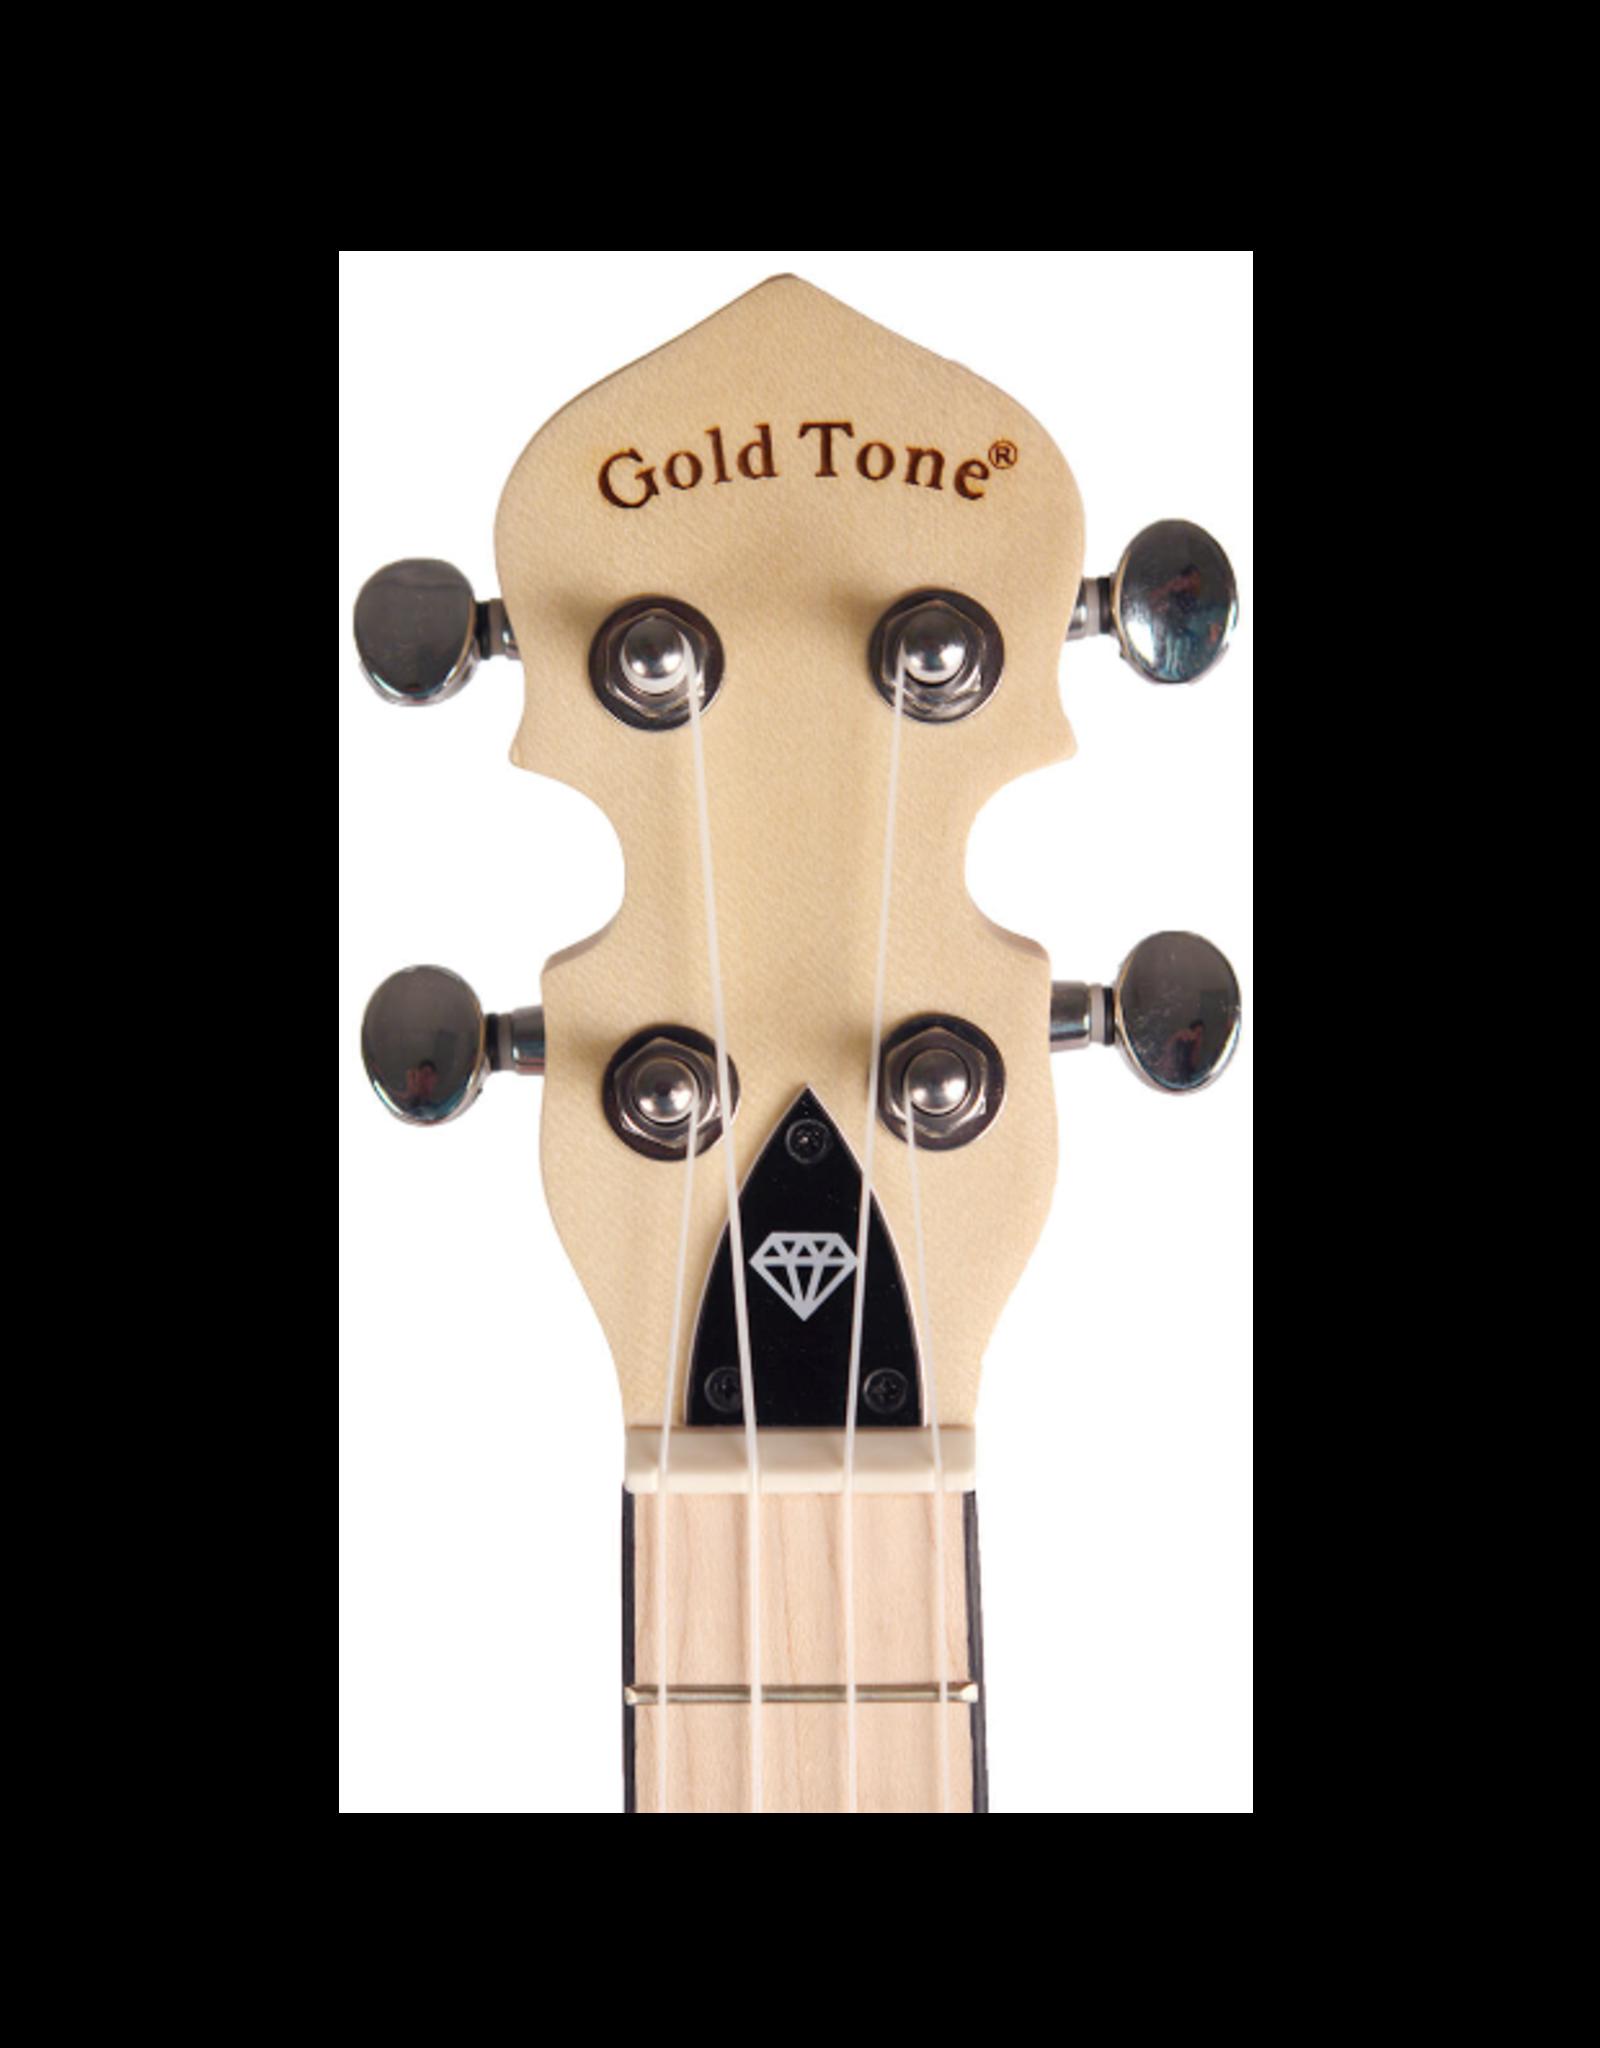 Gold Tone Little Gem Diamond (Clear) See-Through Banjo Ukulele